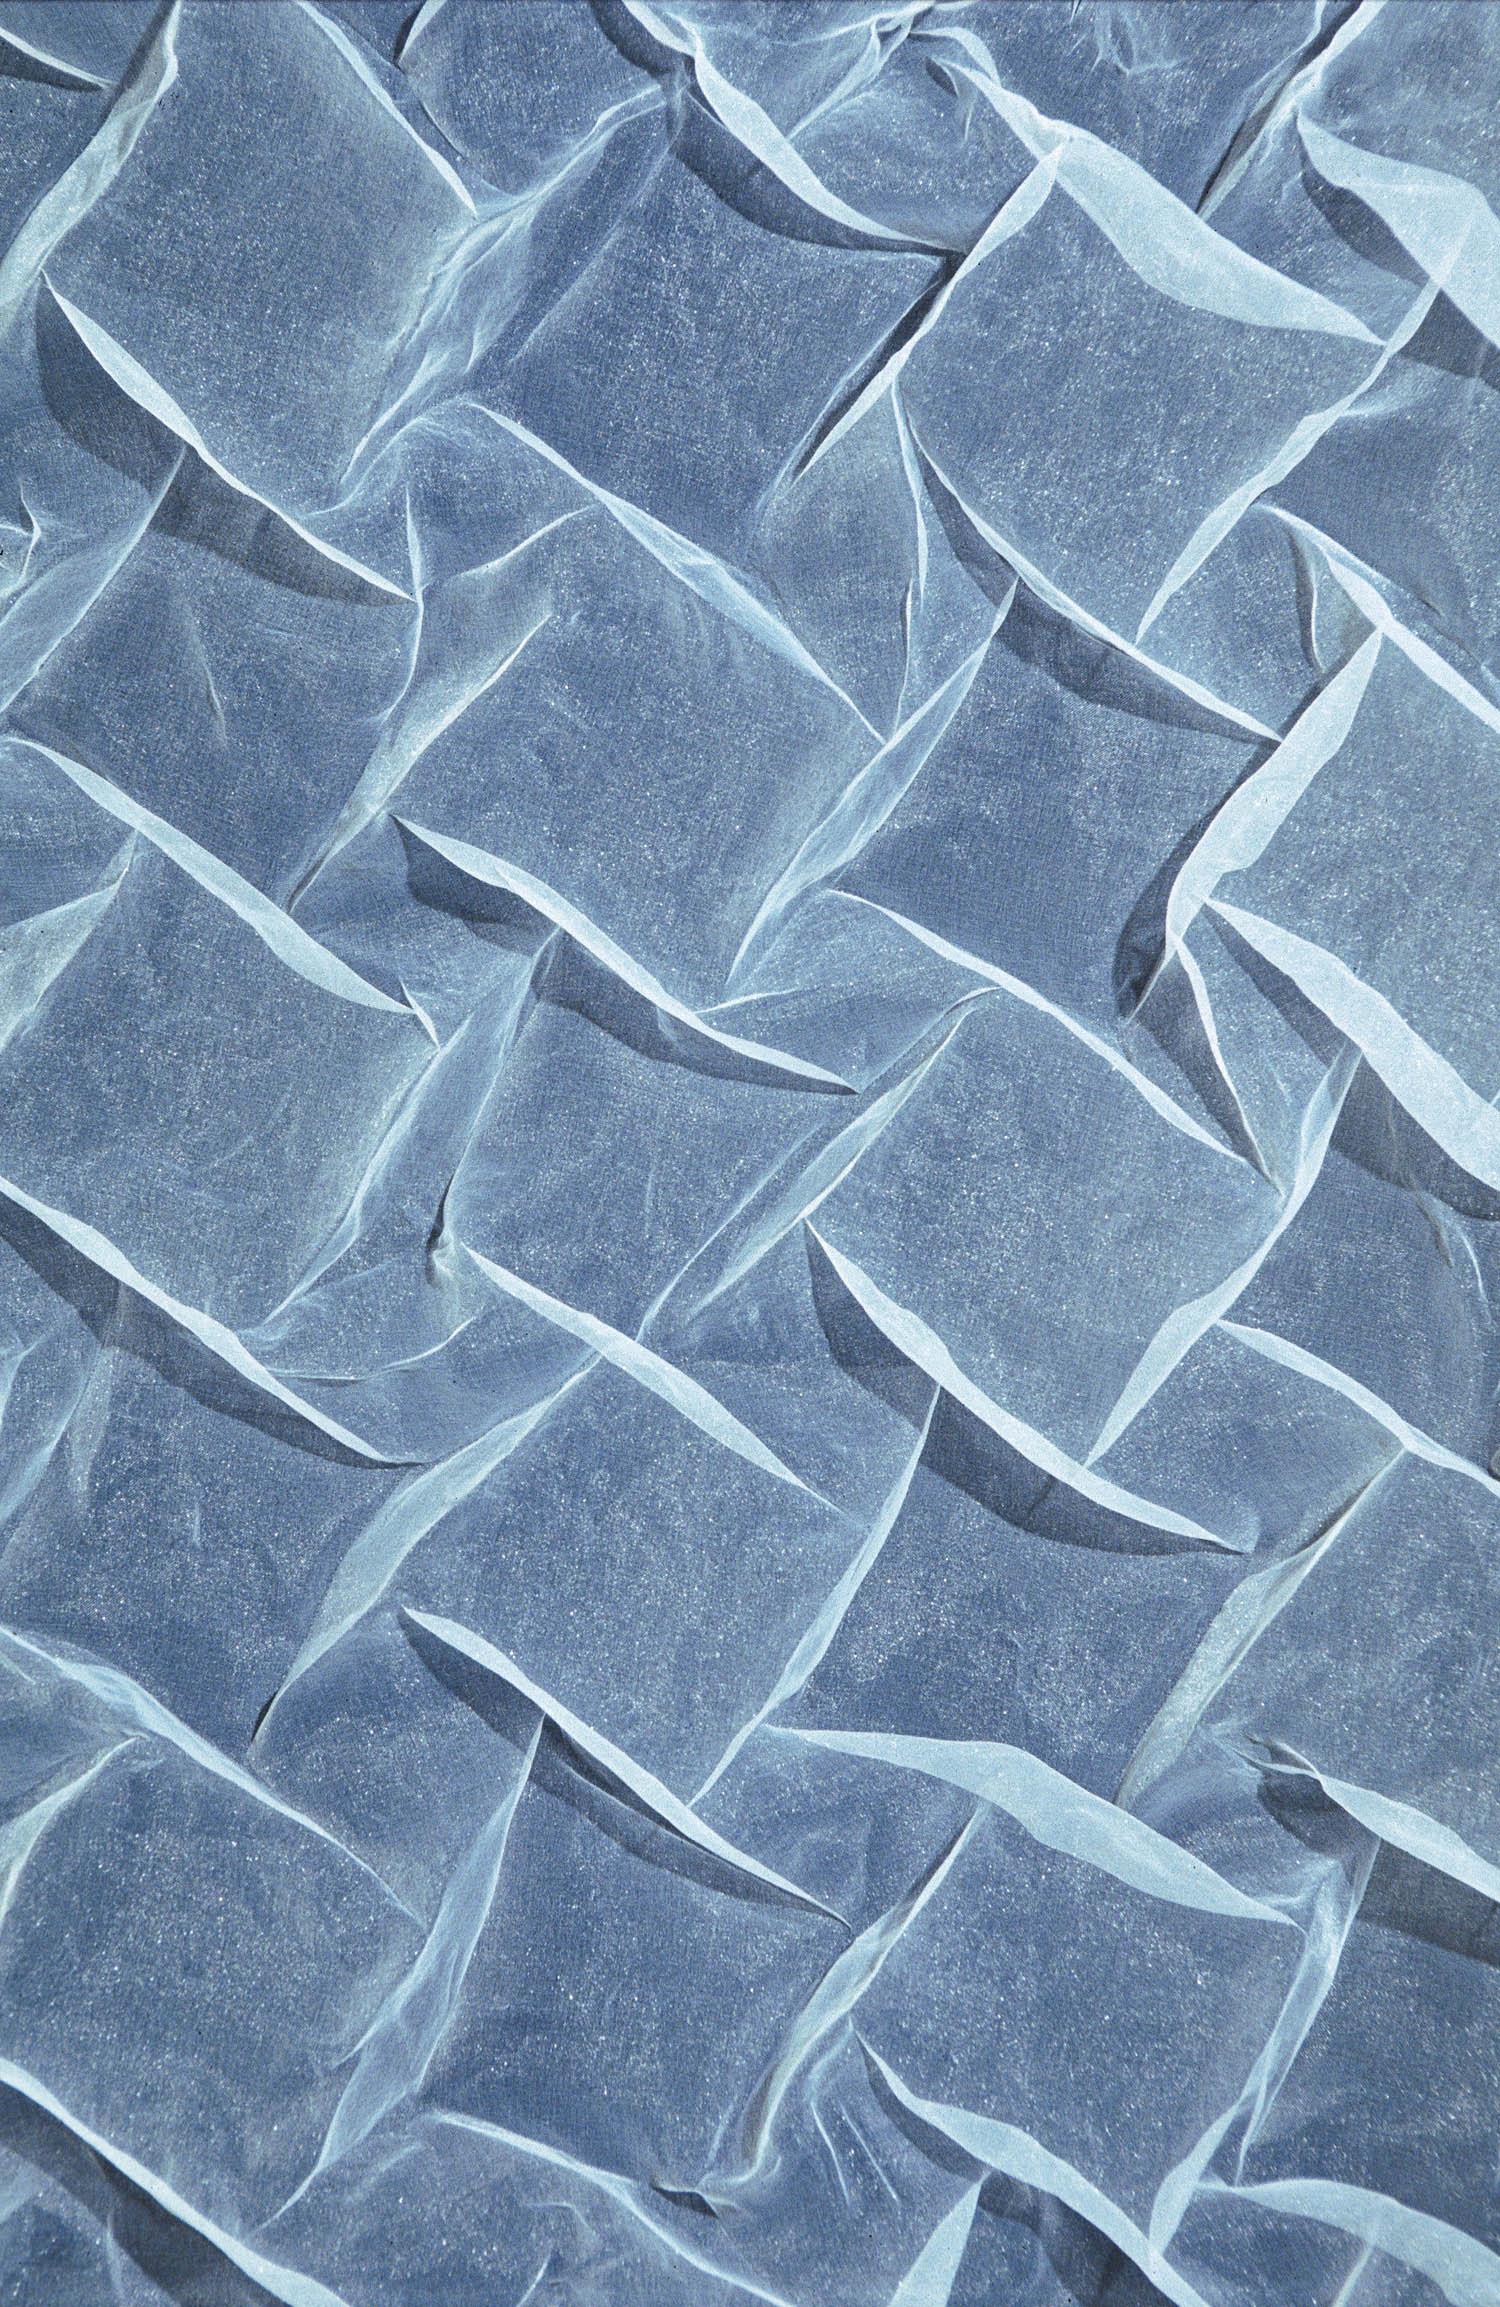 Tutte le immagini courtesy Werner Sobek © ILEK Ricerche sui tessuti. Origami